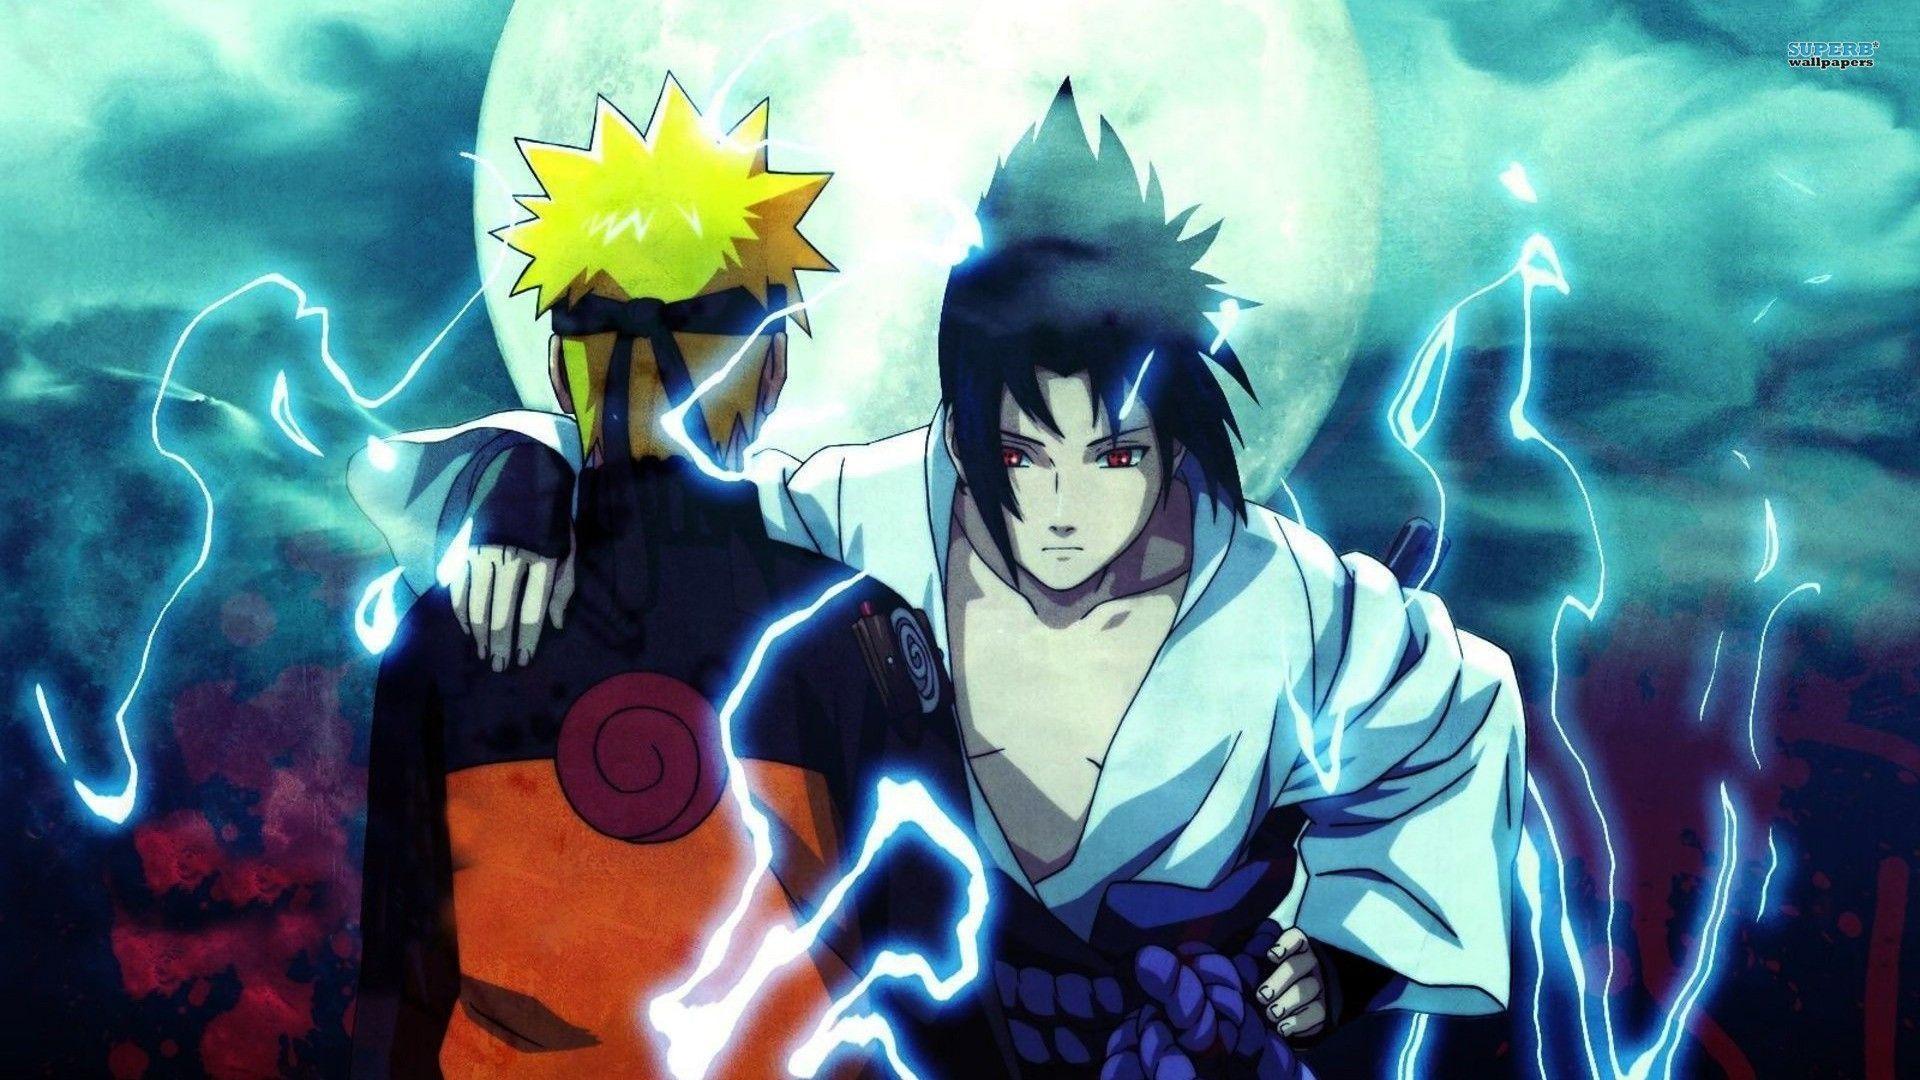 Naruto and Sasuke, PC Wallpaper HD